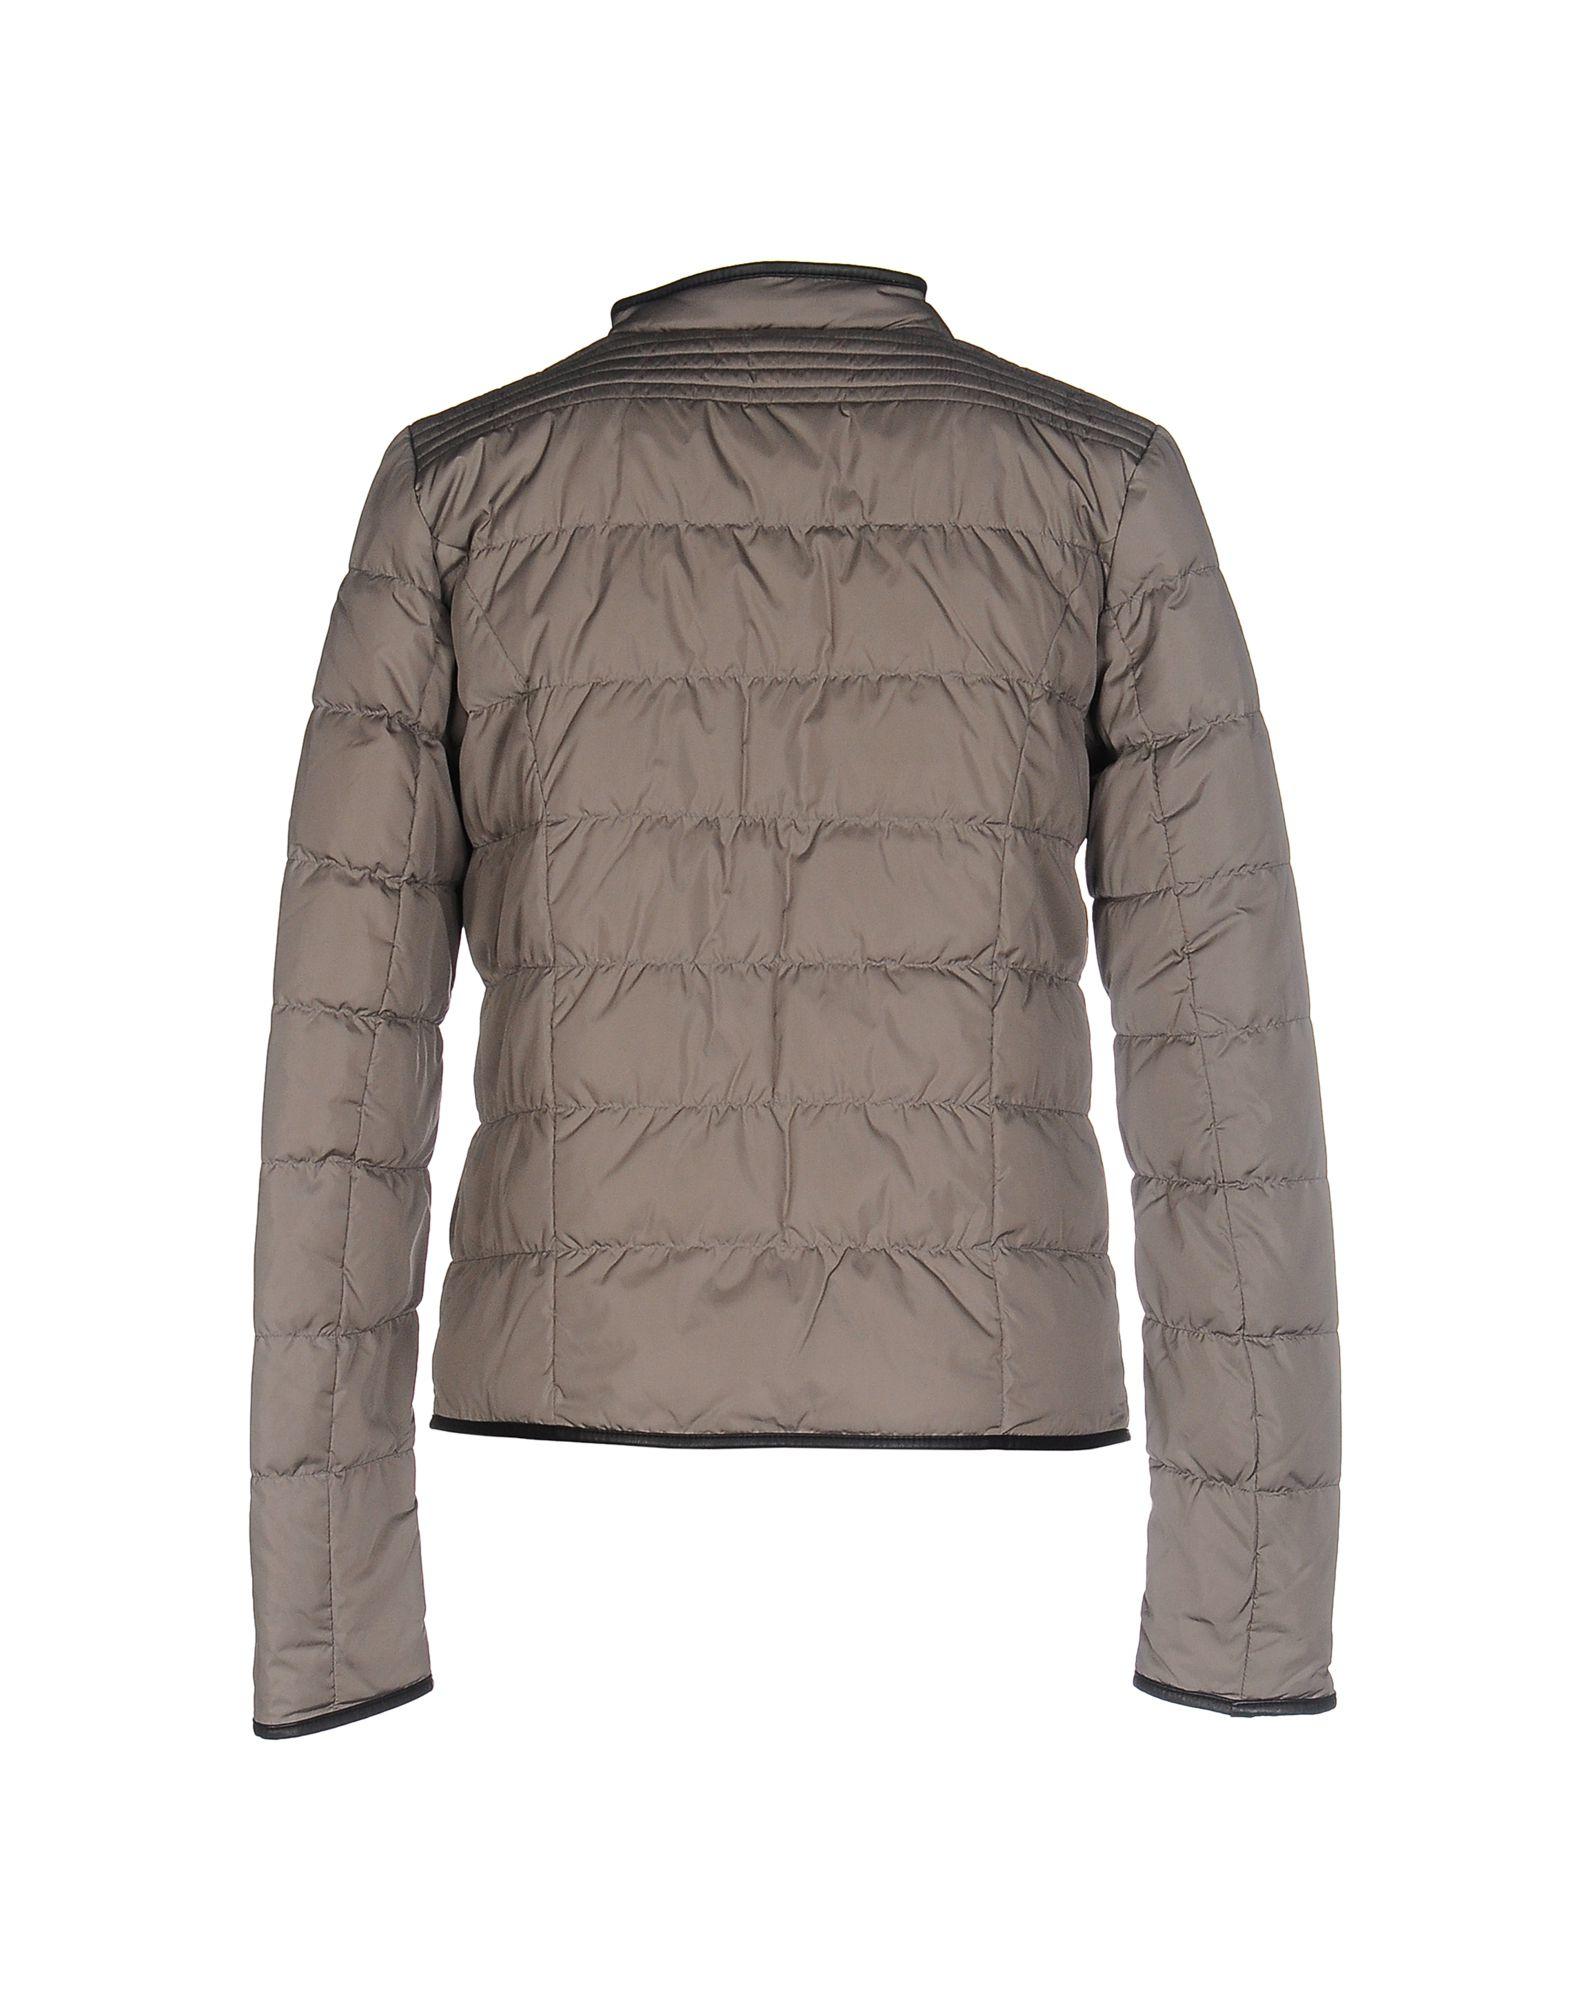 Maison scotch down jacket in gray lyst for Atelier maison scotch